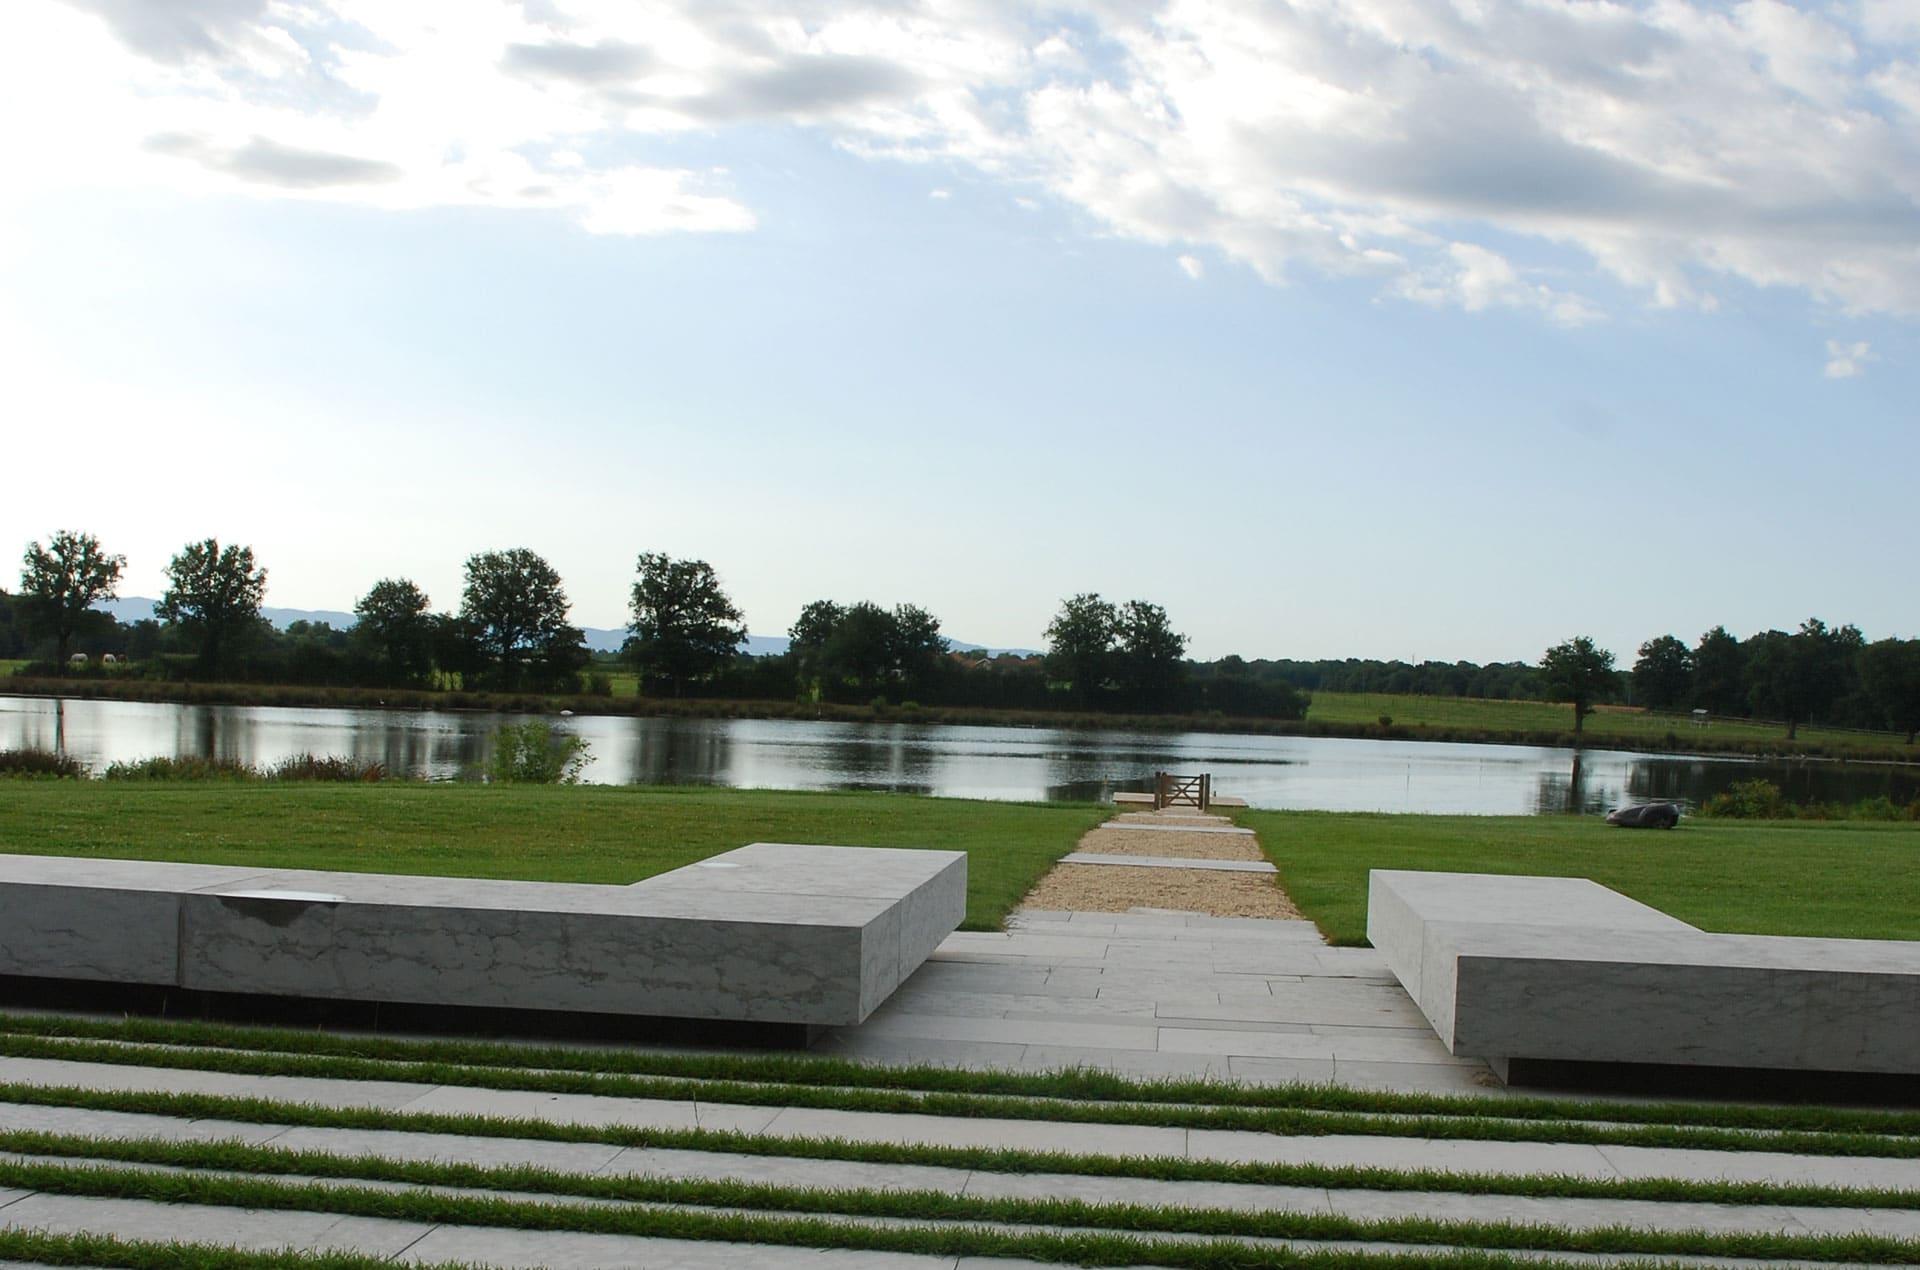 architec-terrasse-pierre-verdure-lac